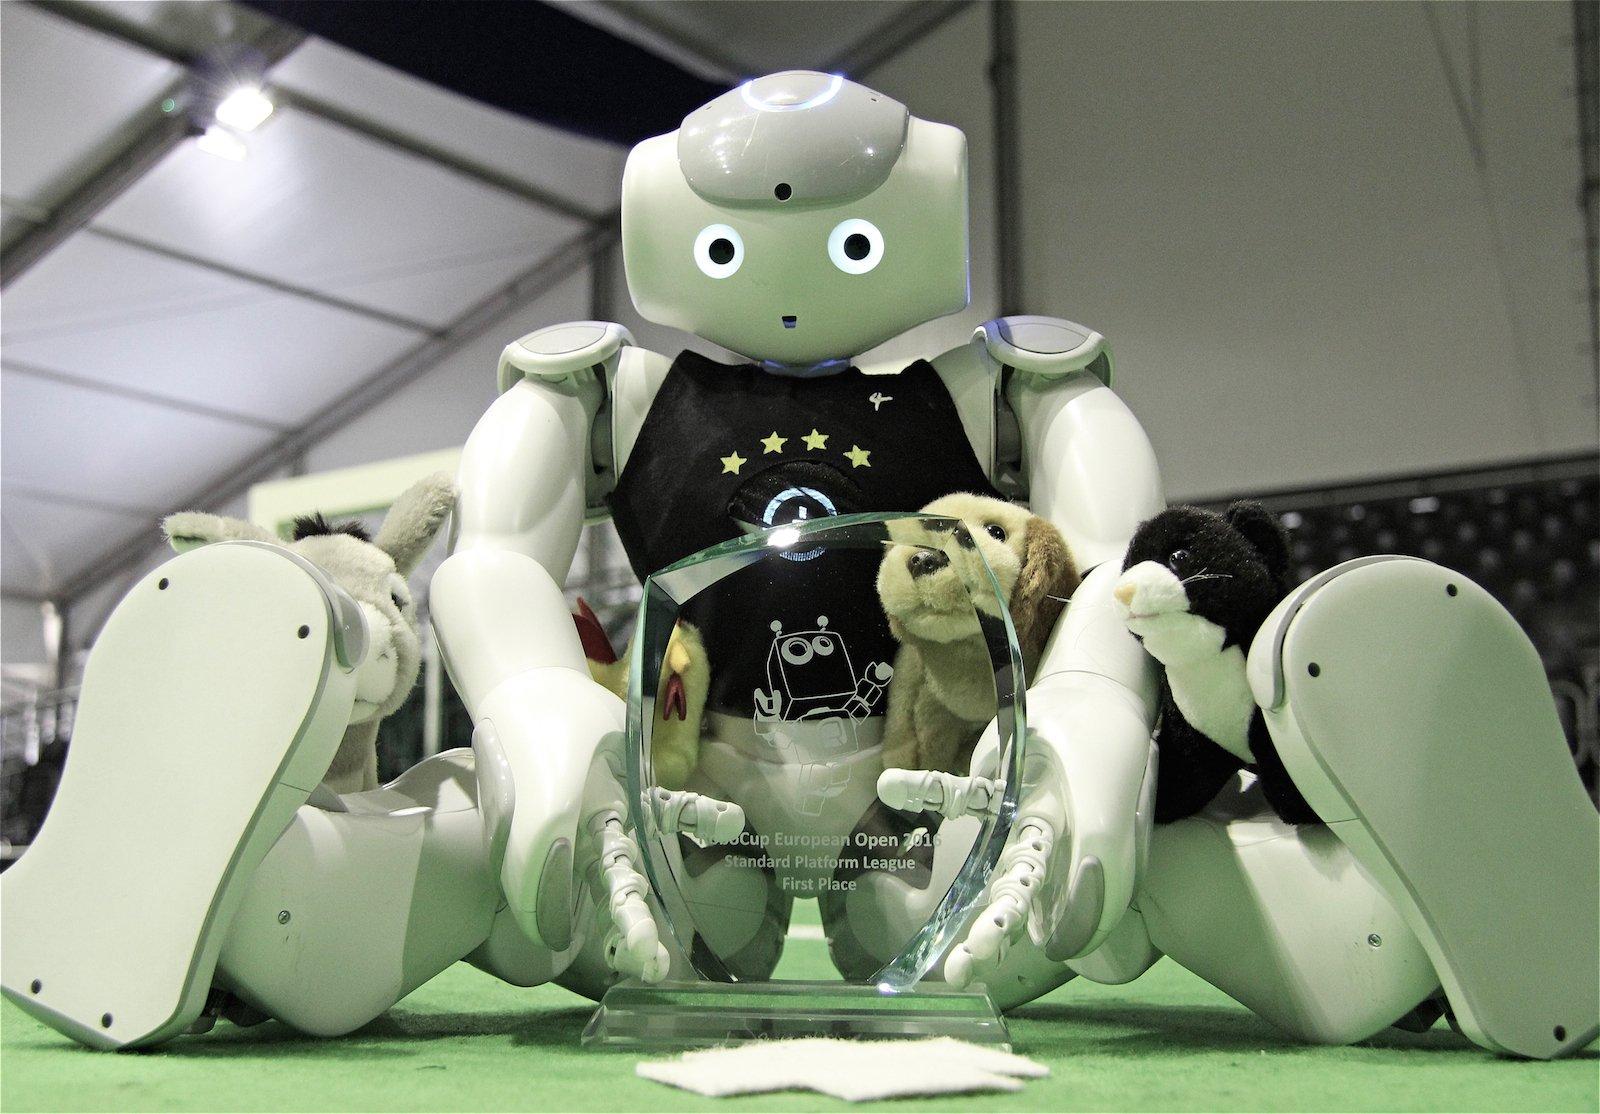 NAO-Roboter des Teams B-Human mit Sieger-Pokal.